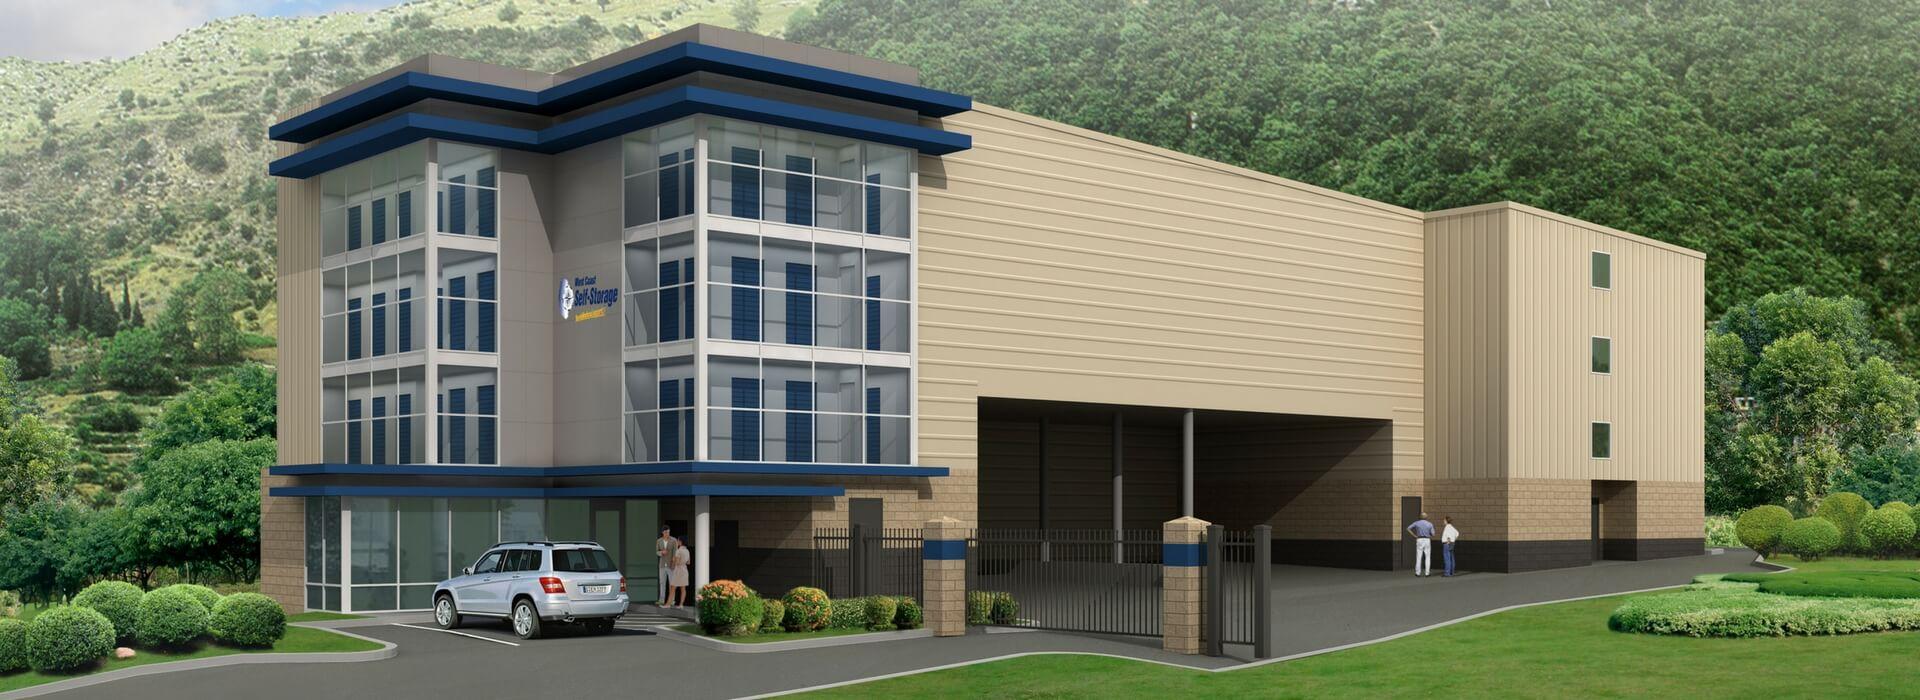 Attirant Daly City, CA Storage Units At 1001 E Market St | West Coast Self Storage